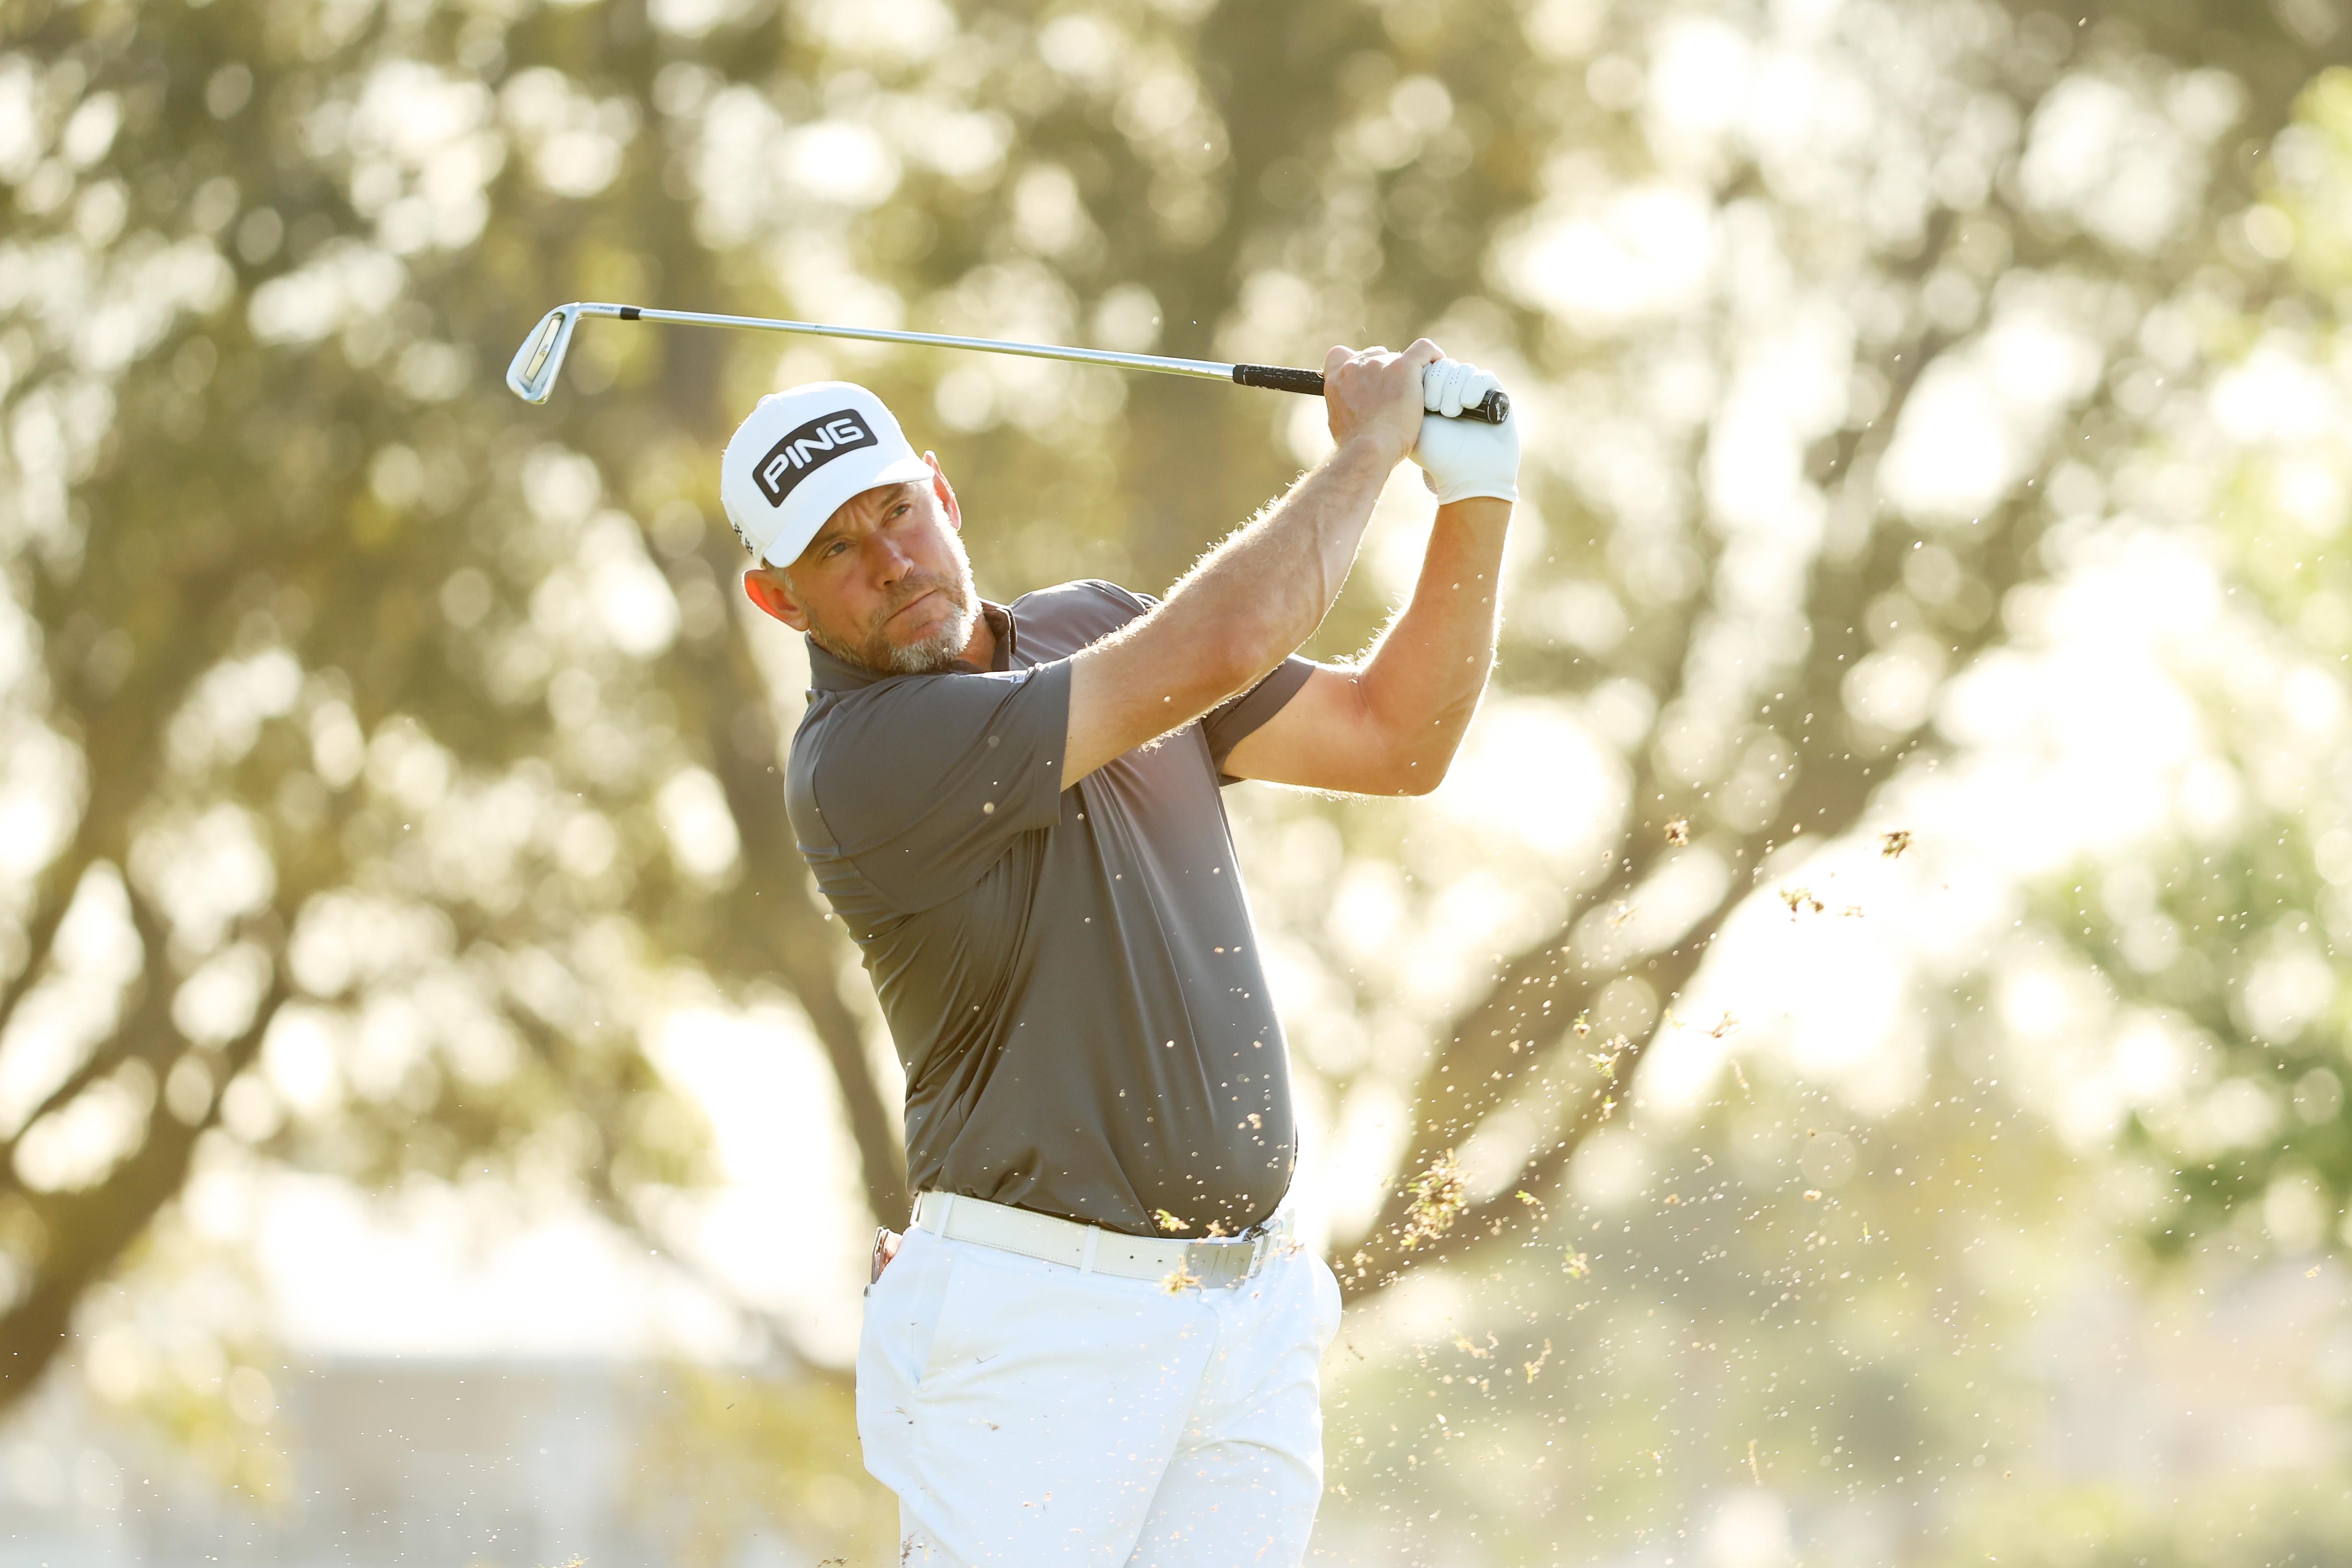 When Will English Golfer Lee Westwood Retire?